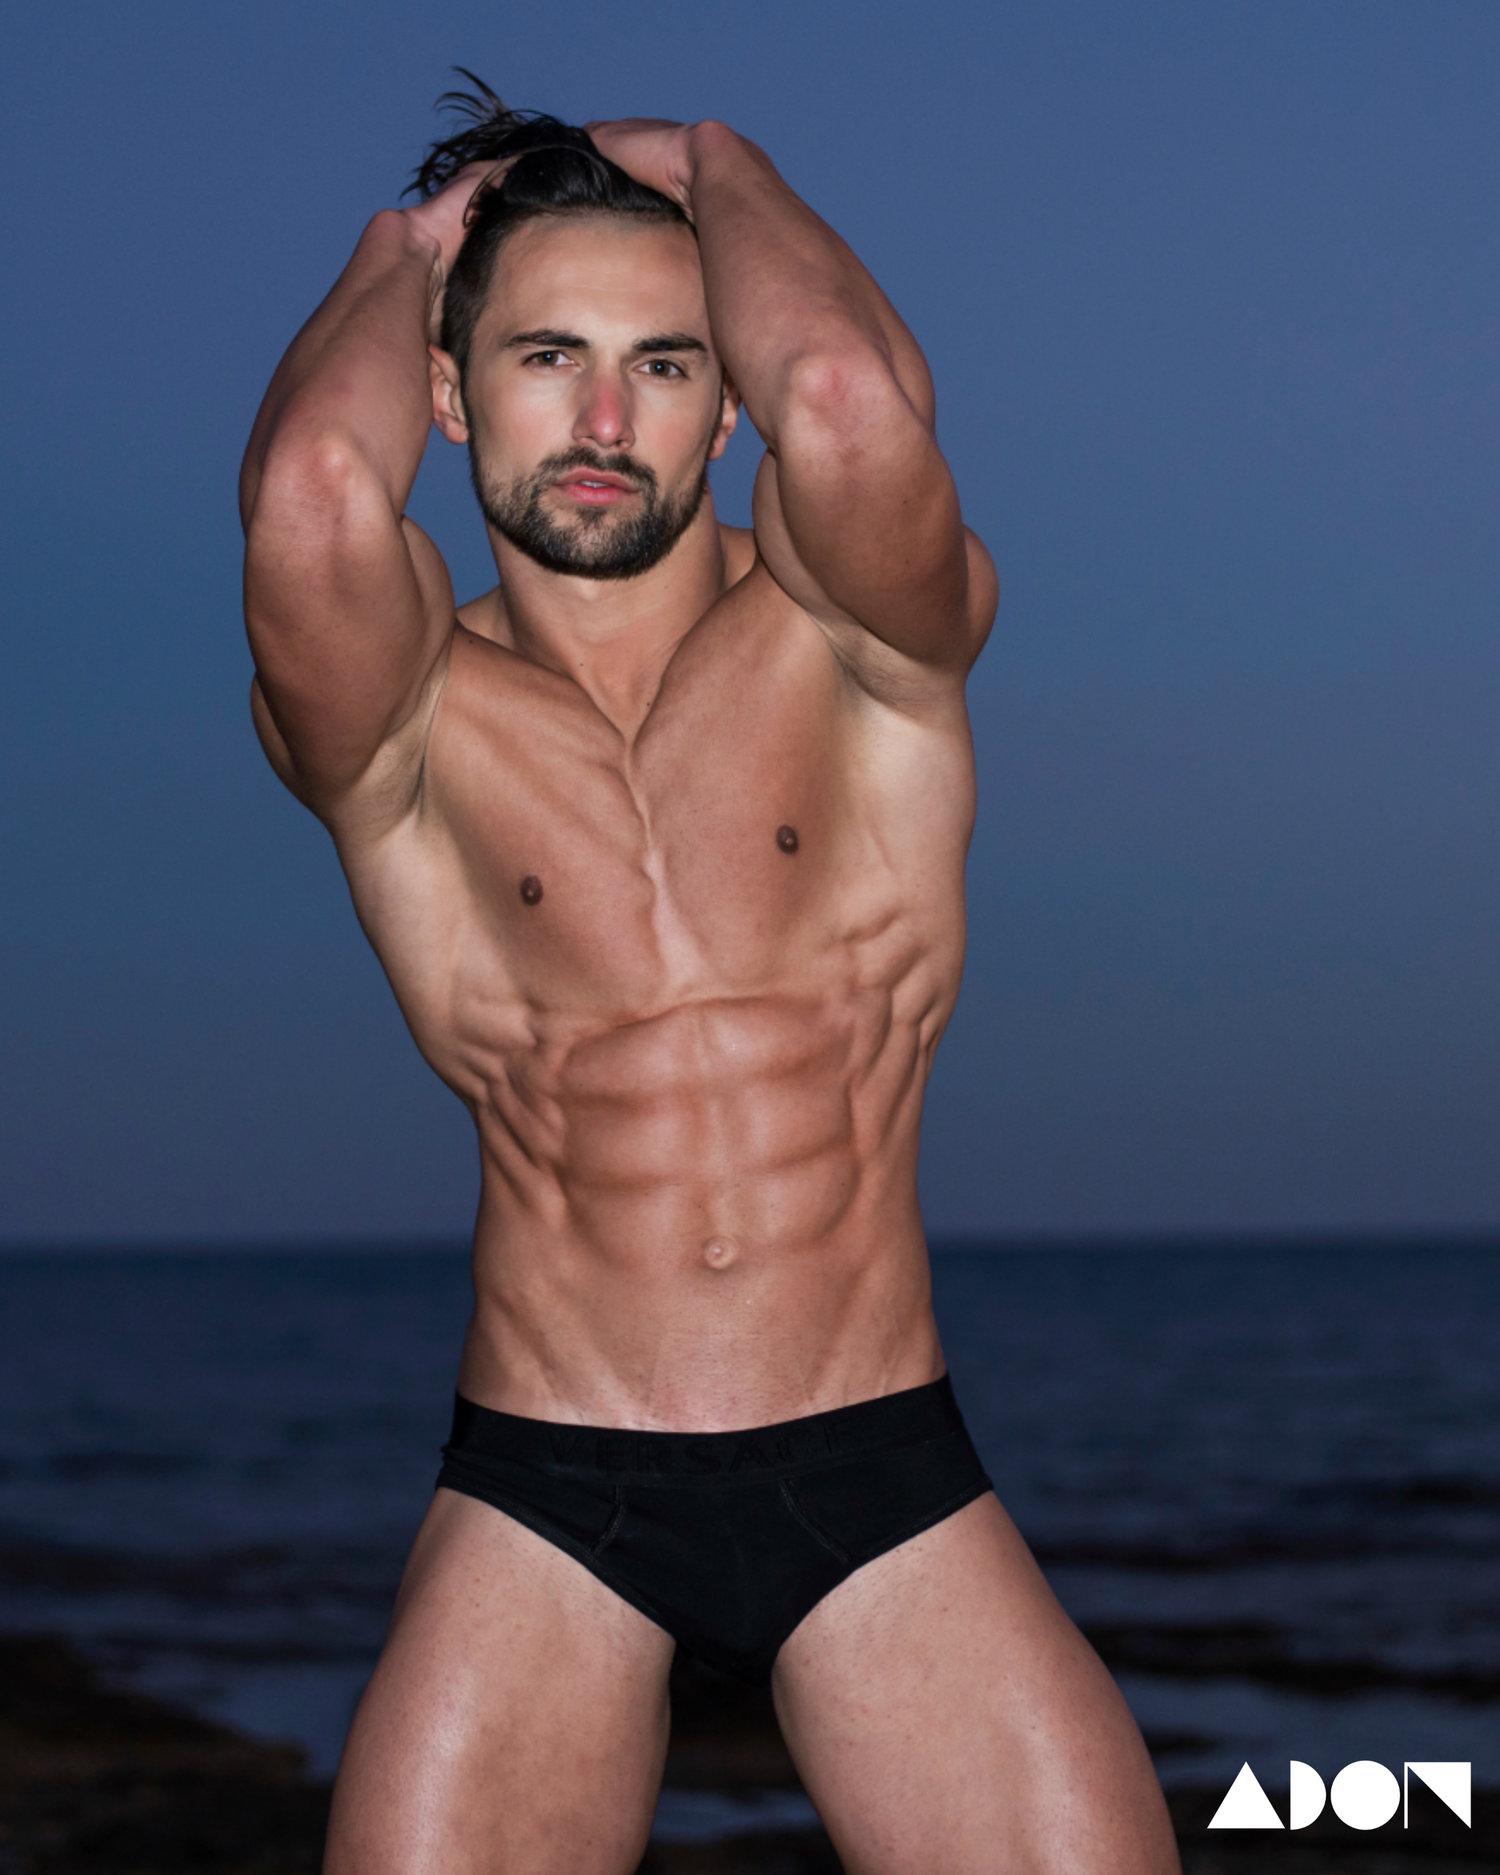 Adon Exclusive: Model Mykhailo Kish By Stavros Christodoulou